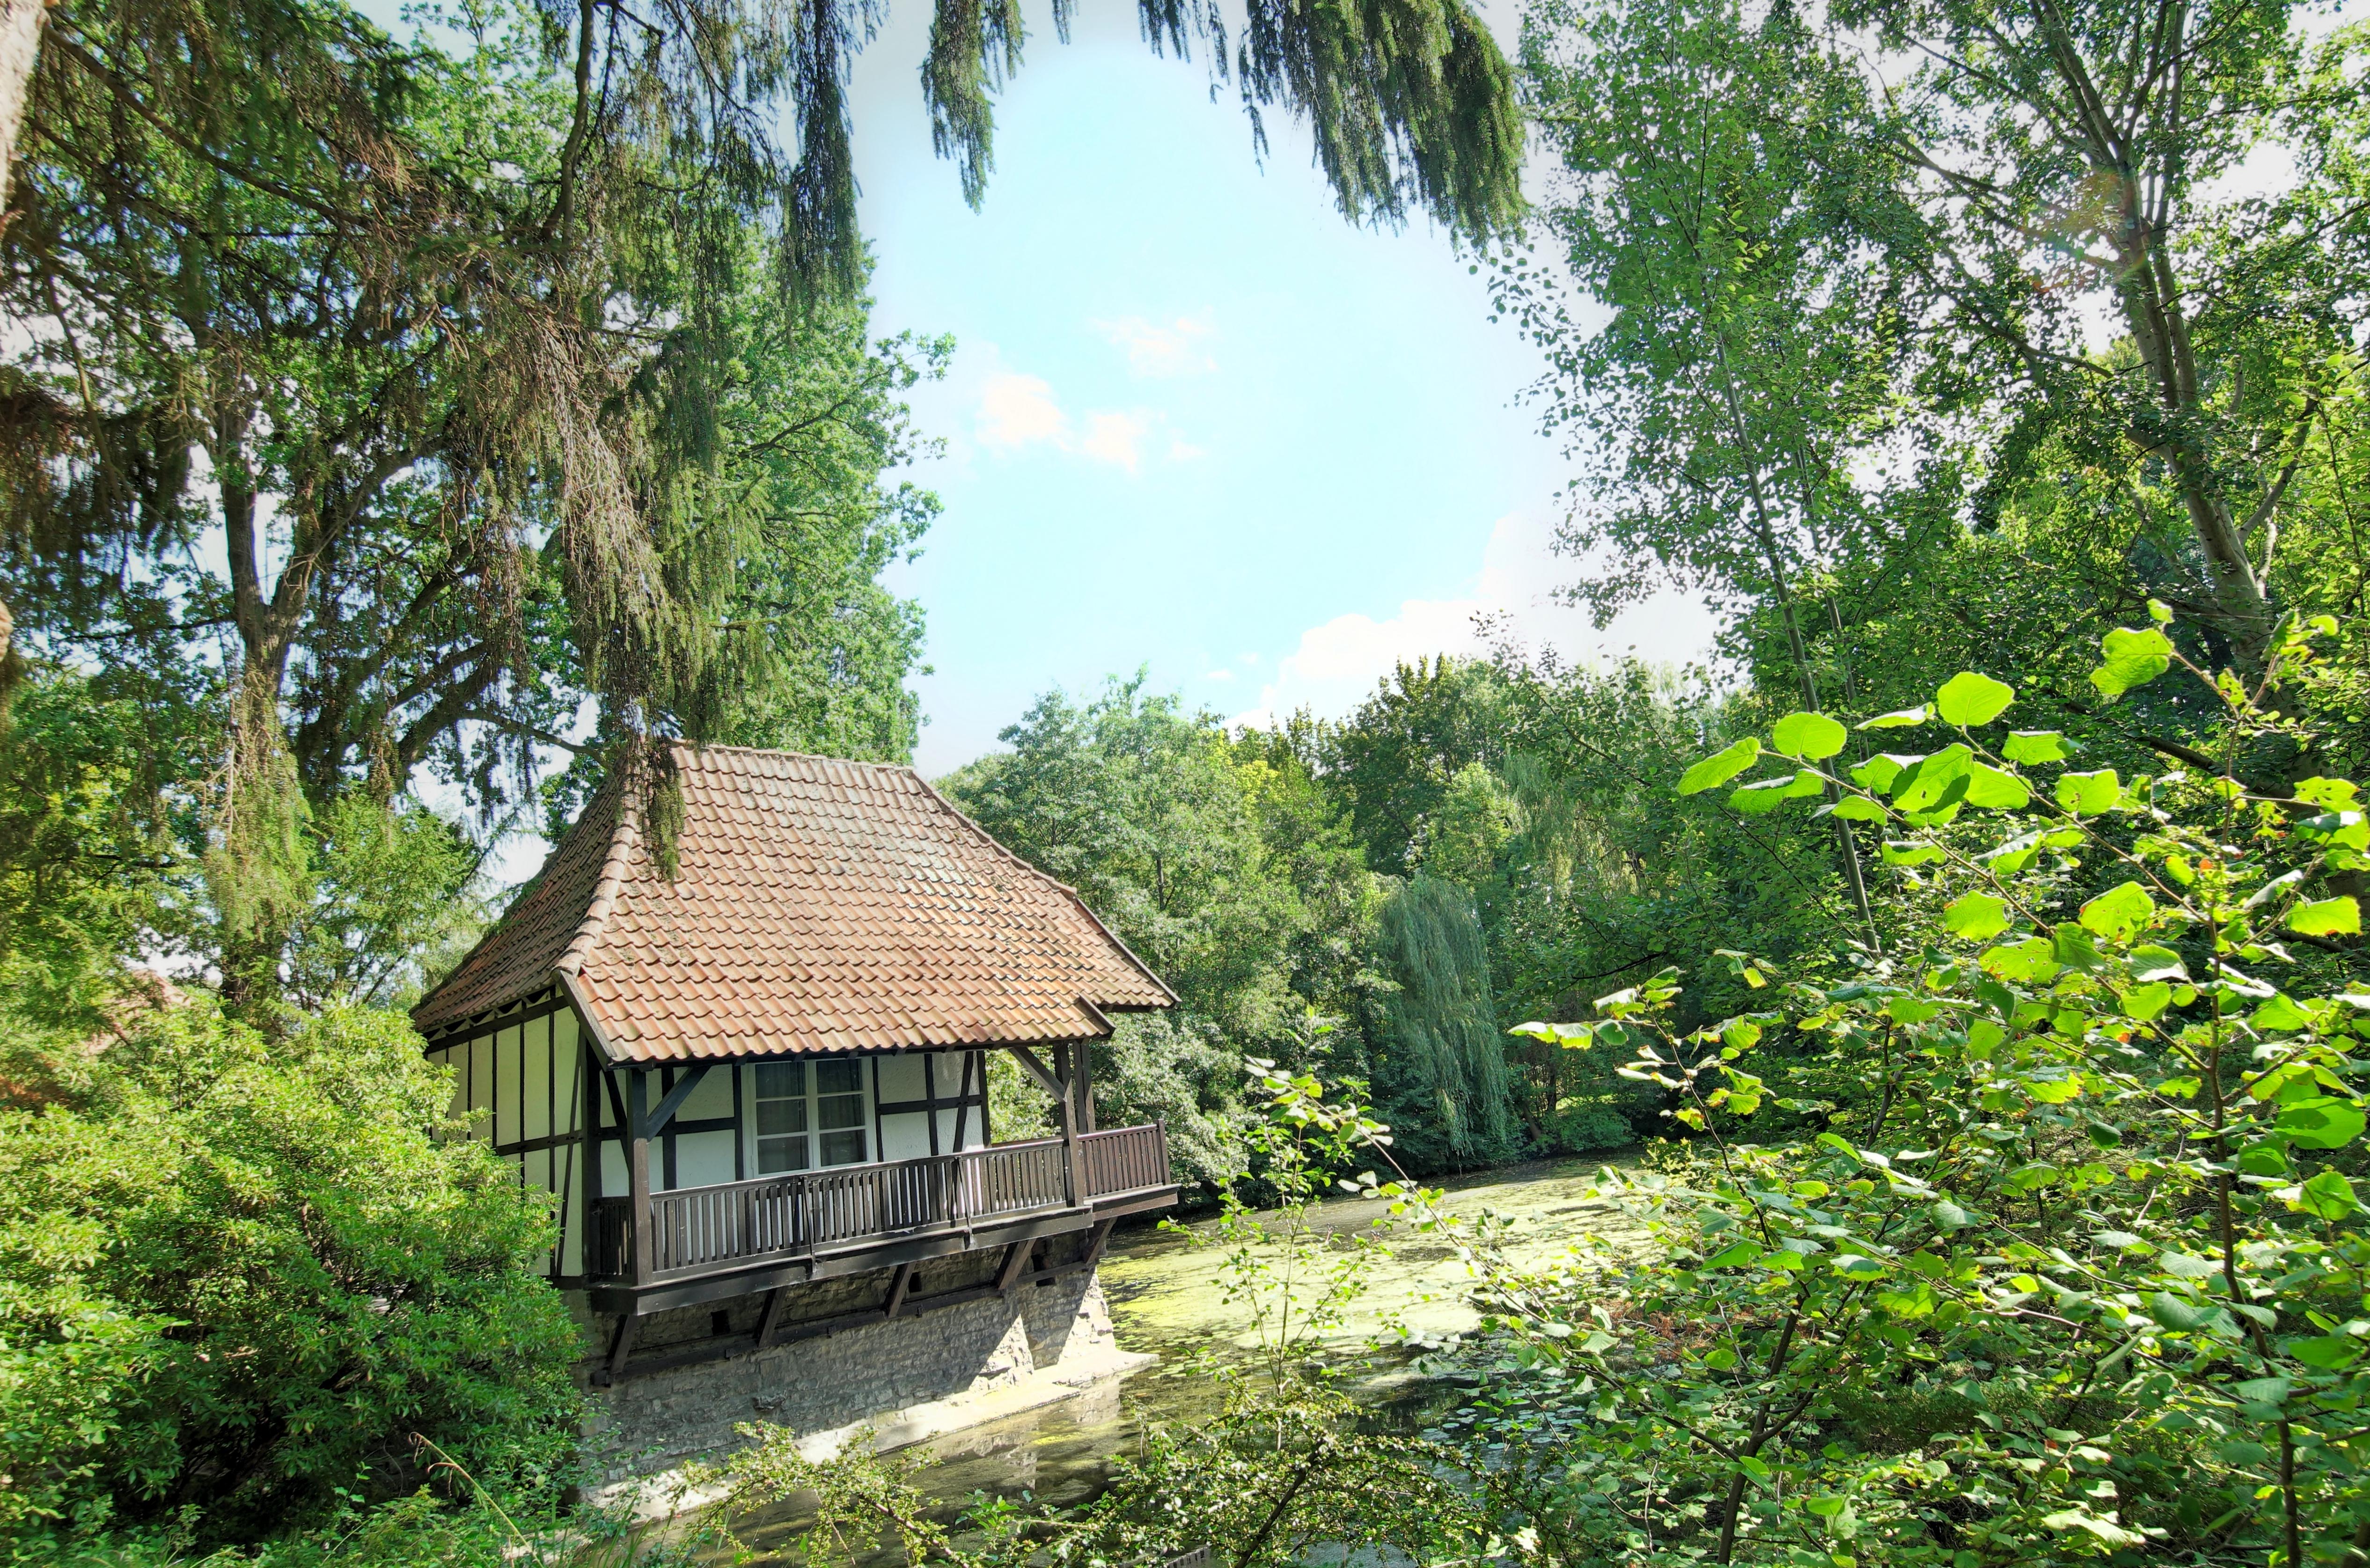 File:Teehaus Im Garten Des Westfalenhofs Hannover Kirchrode